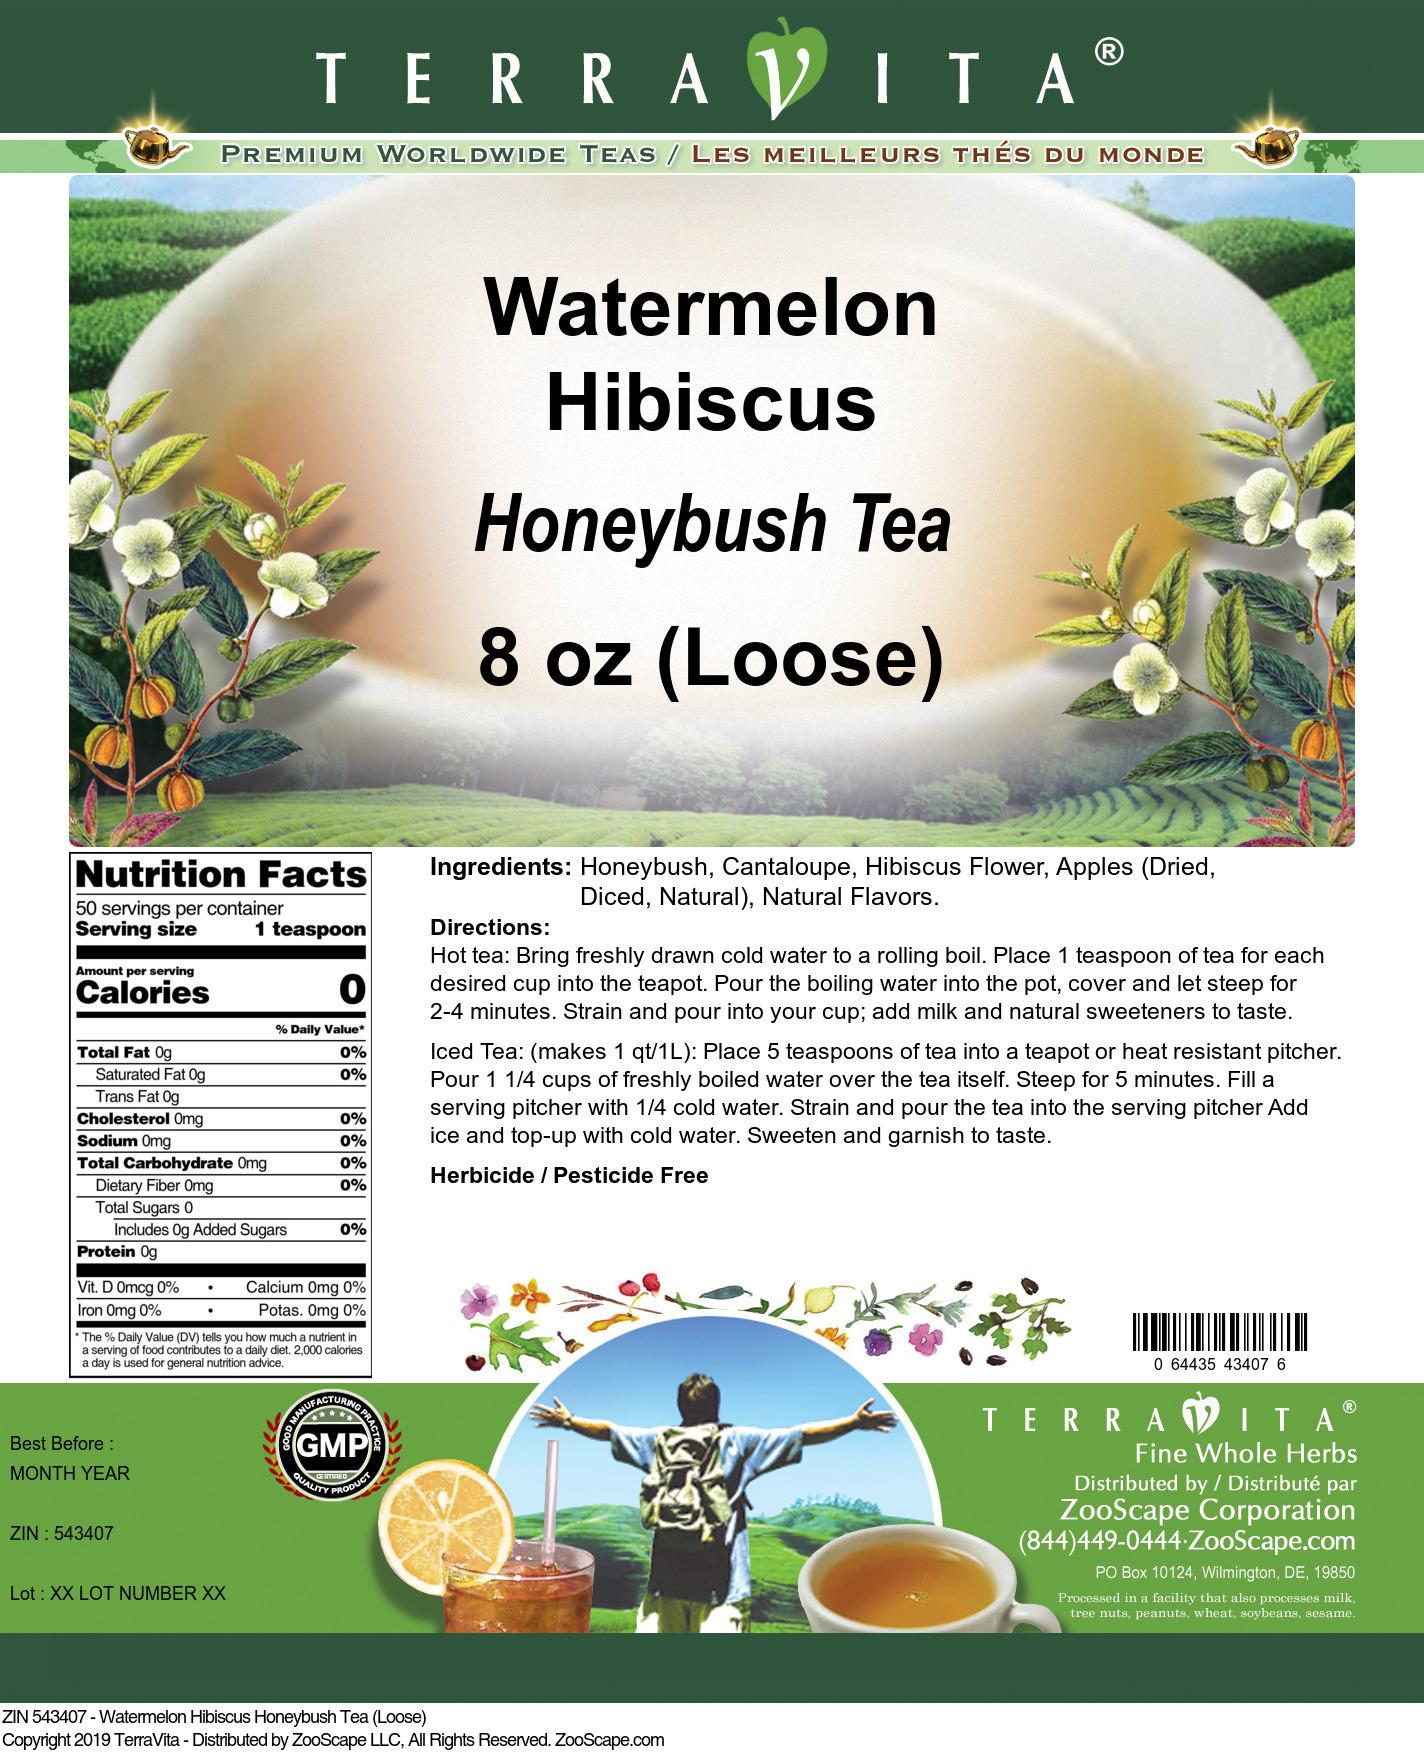 Watermelon Hibiscus Honeybush Tea